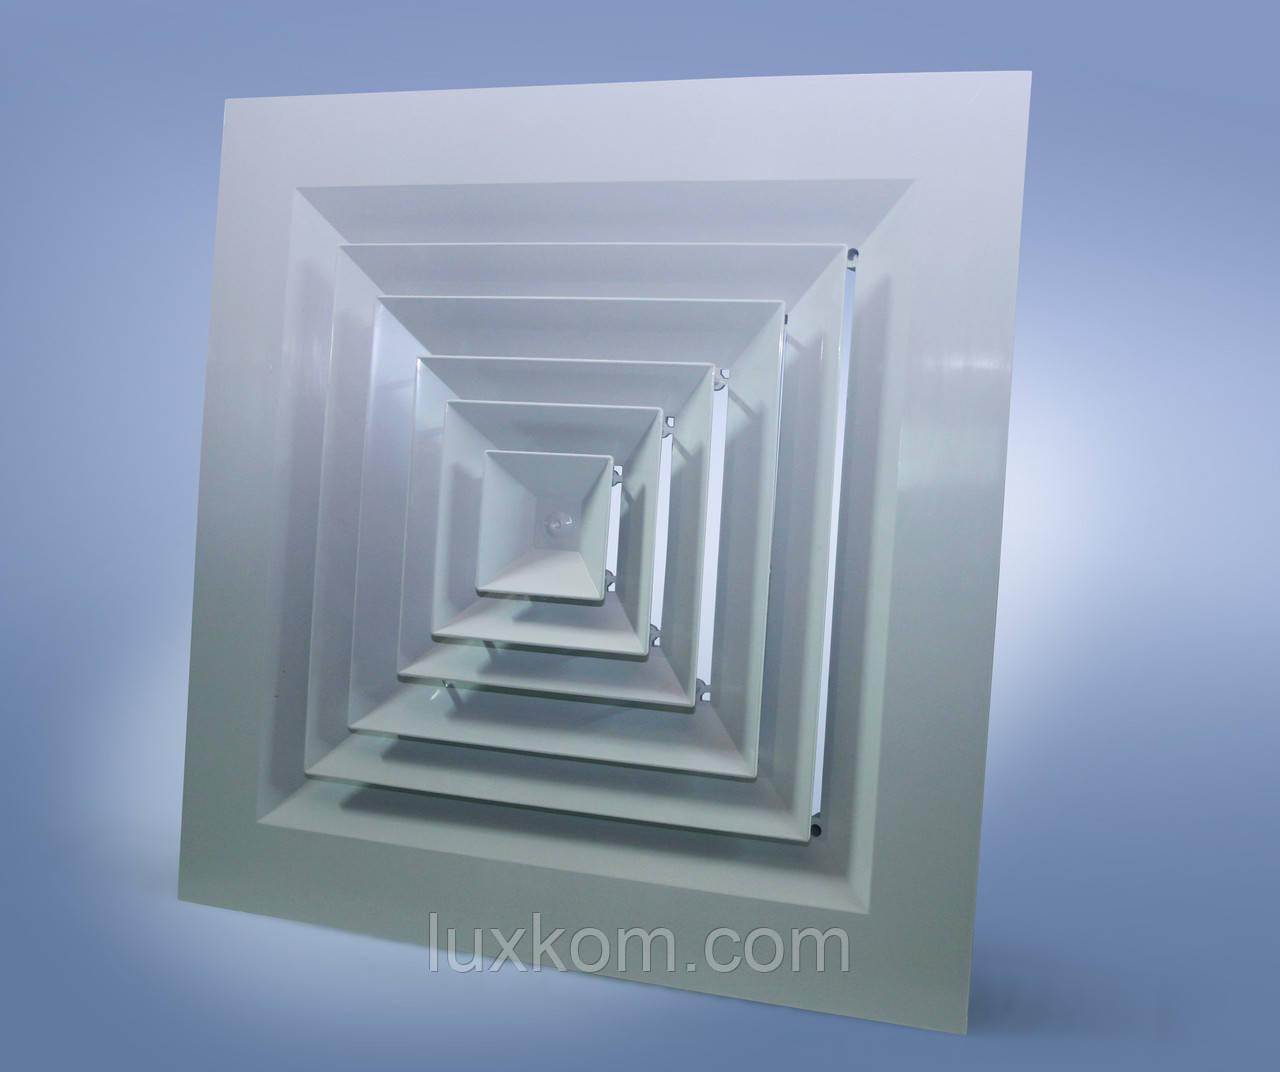 Диффузоры Twitoplast квадратные